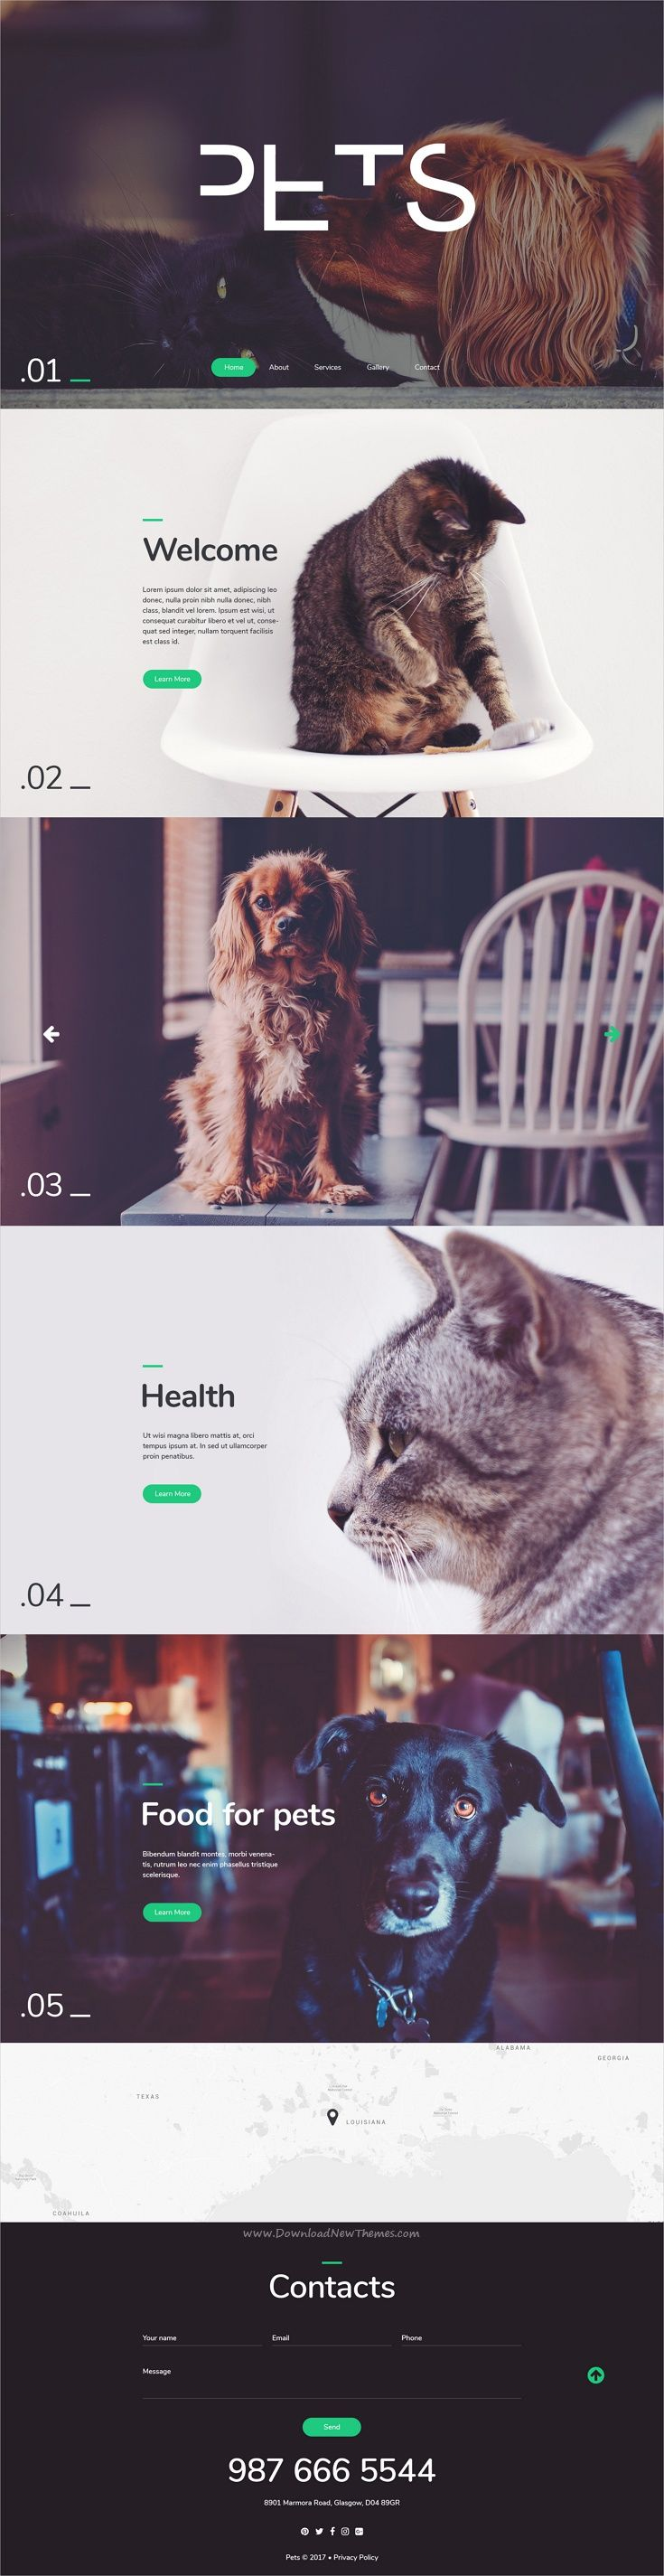 Pets is an elegant, minimal design #PSD template for #webdev #pet services industries websites download now➩ https://themeforest.net/item/pets-modern-psd-template/19343878?ref=Datasata